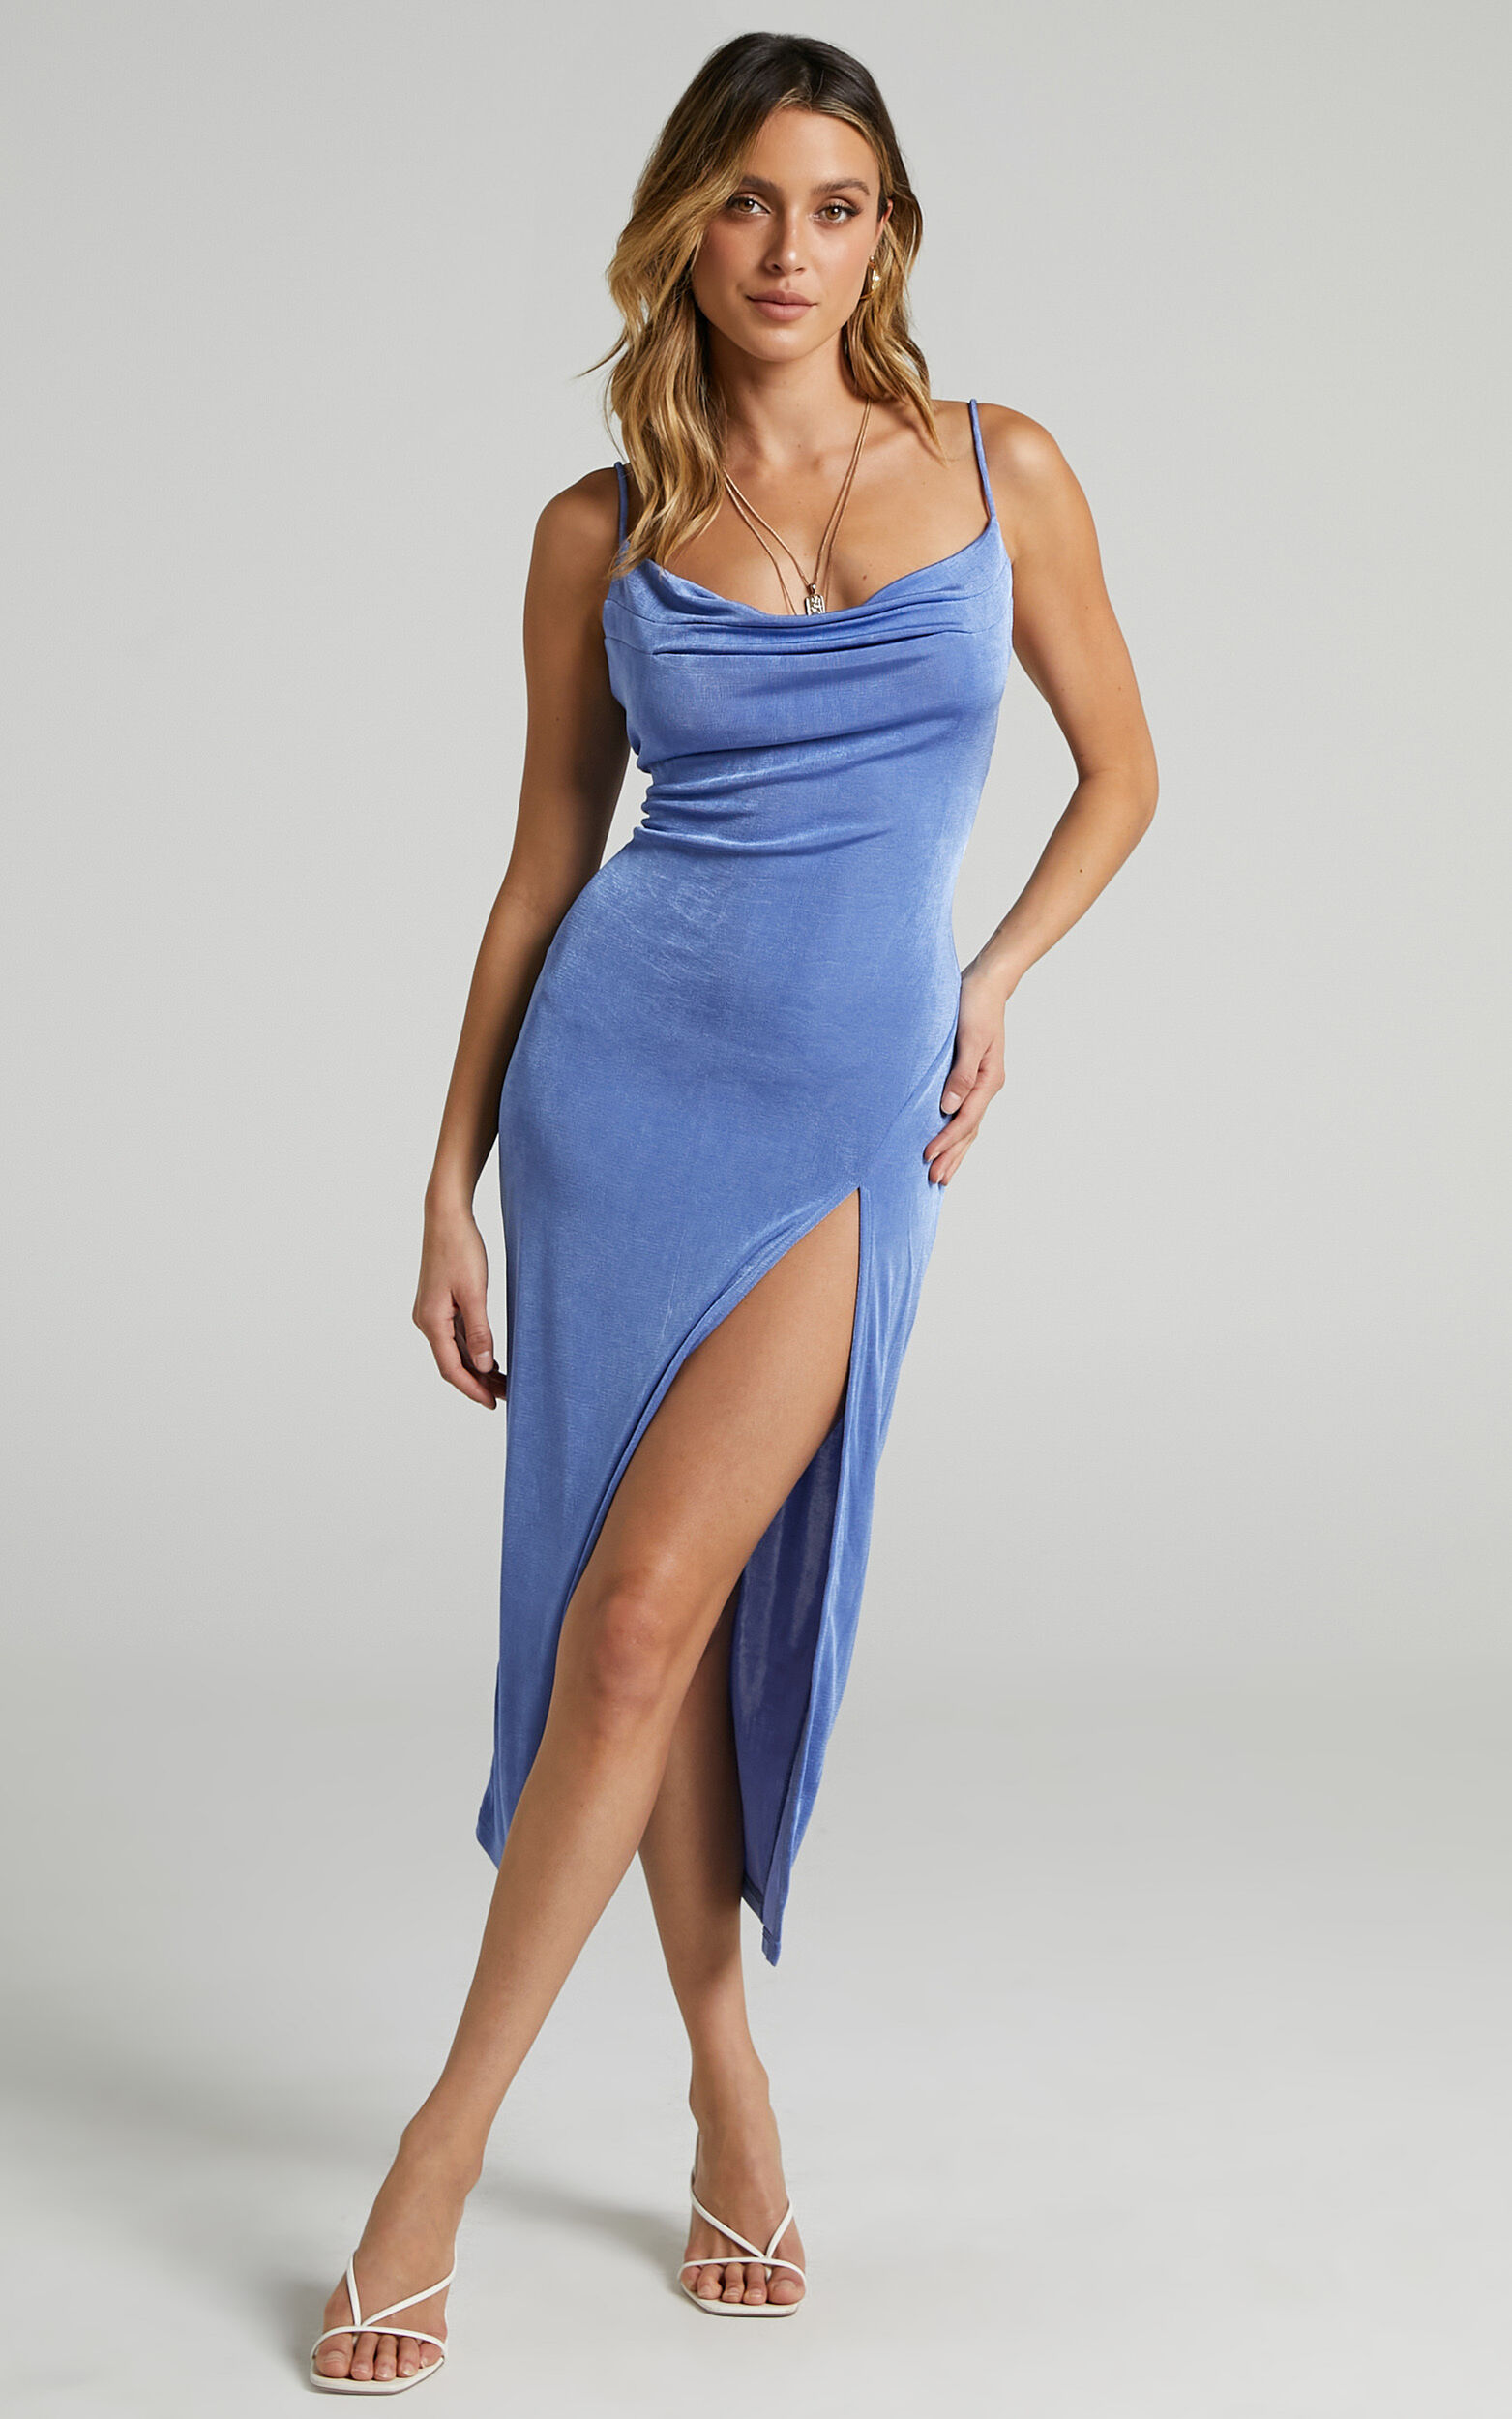 She.Is.Us - Slinky Slip Dress in Periwinkle - L, BLU1, super-hi-res image number null